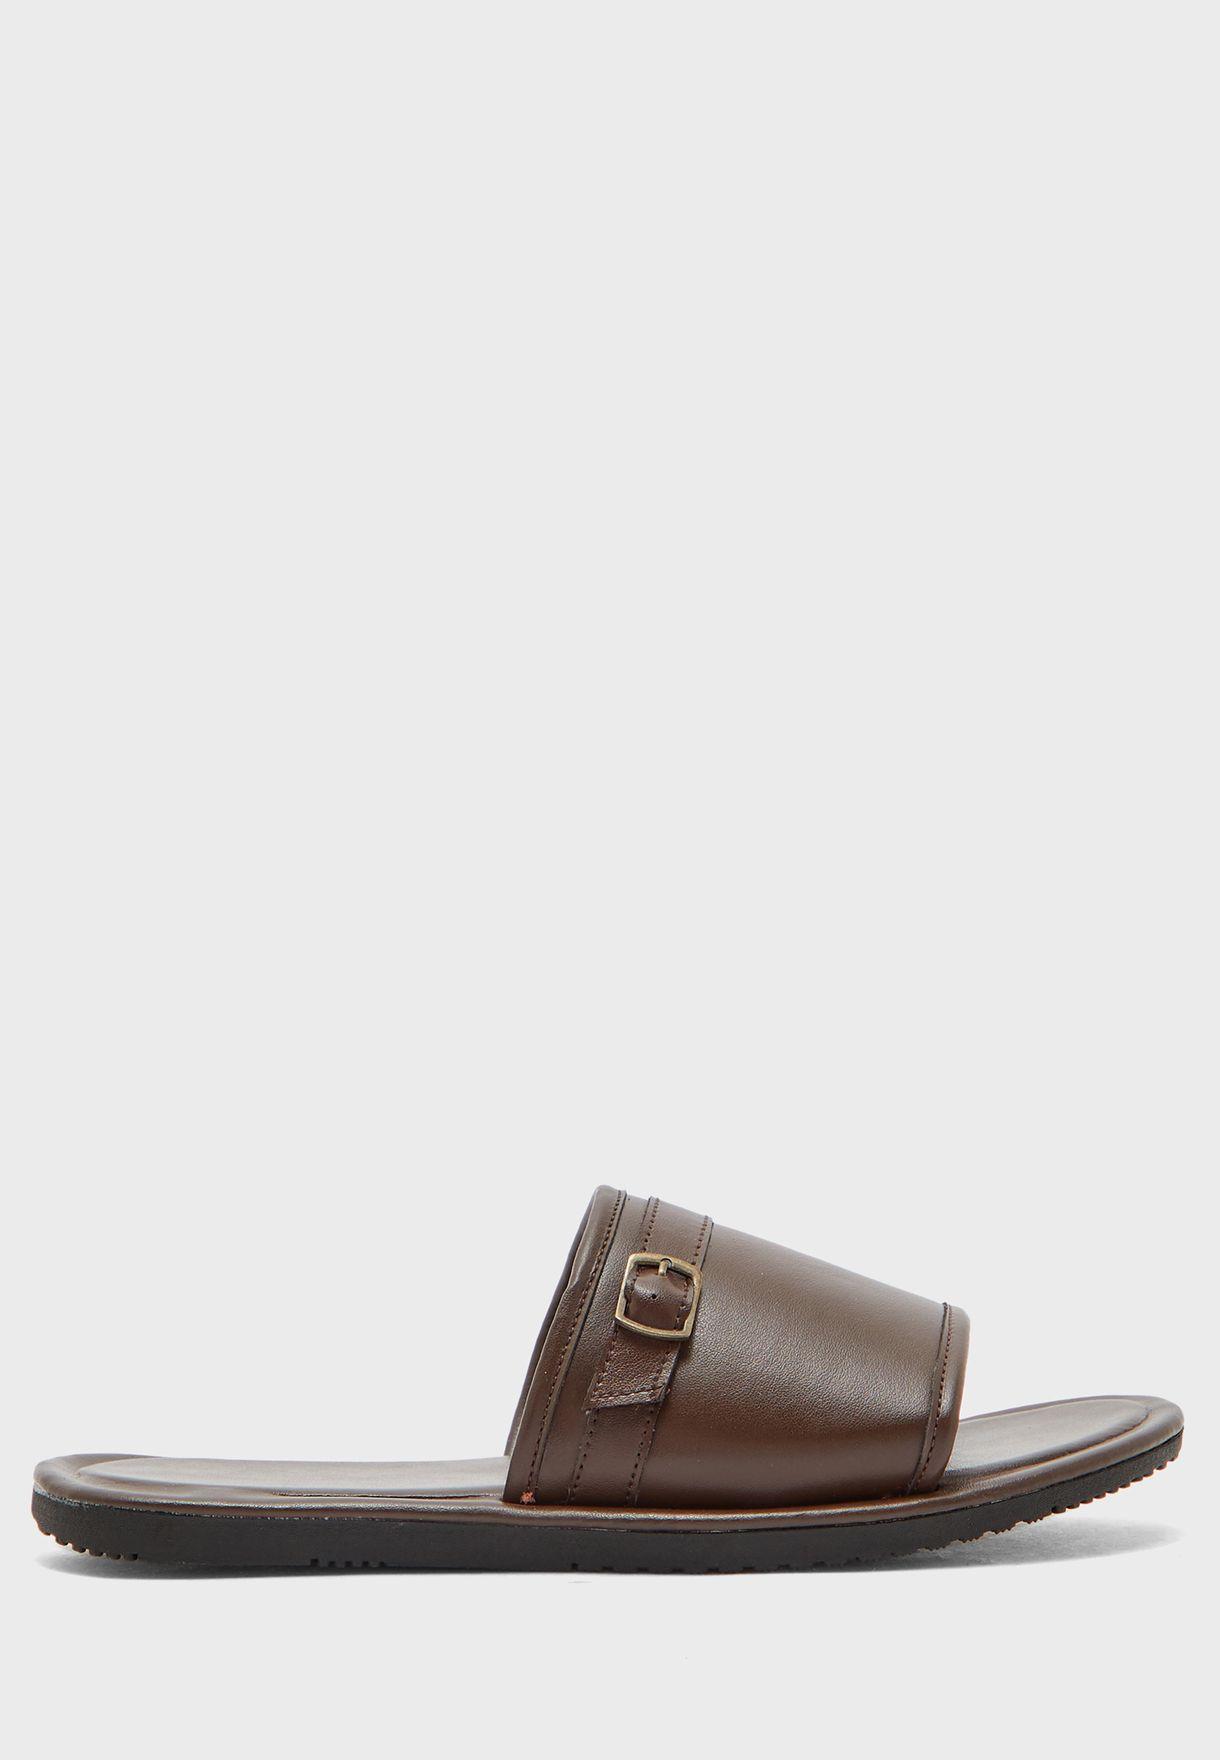 Casual Slides Sandals